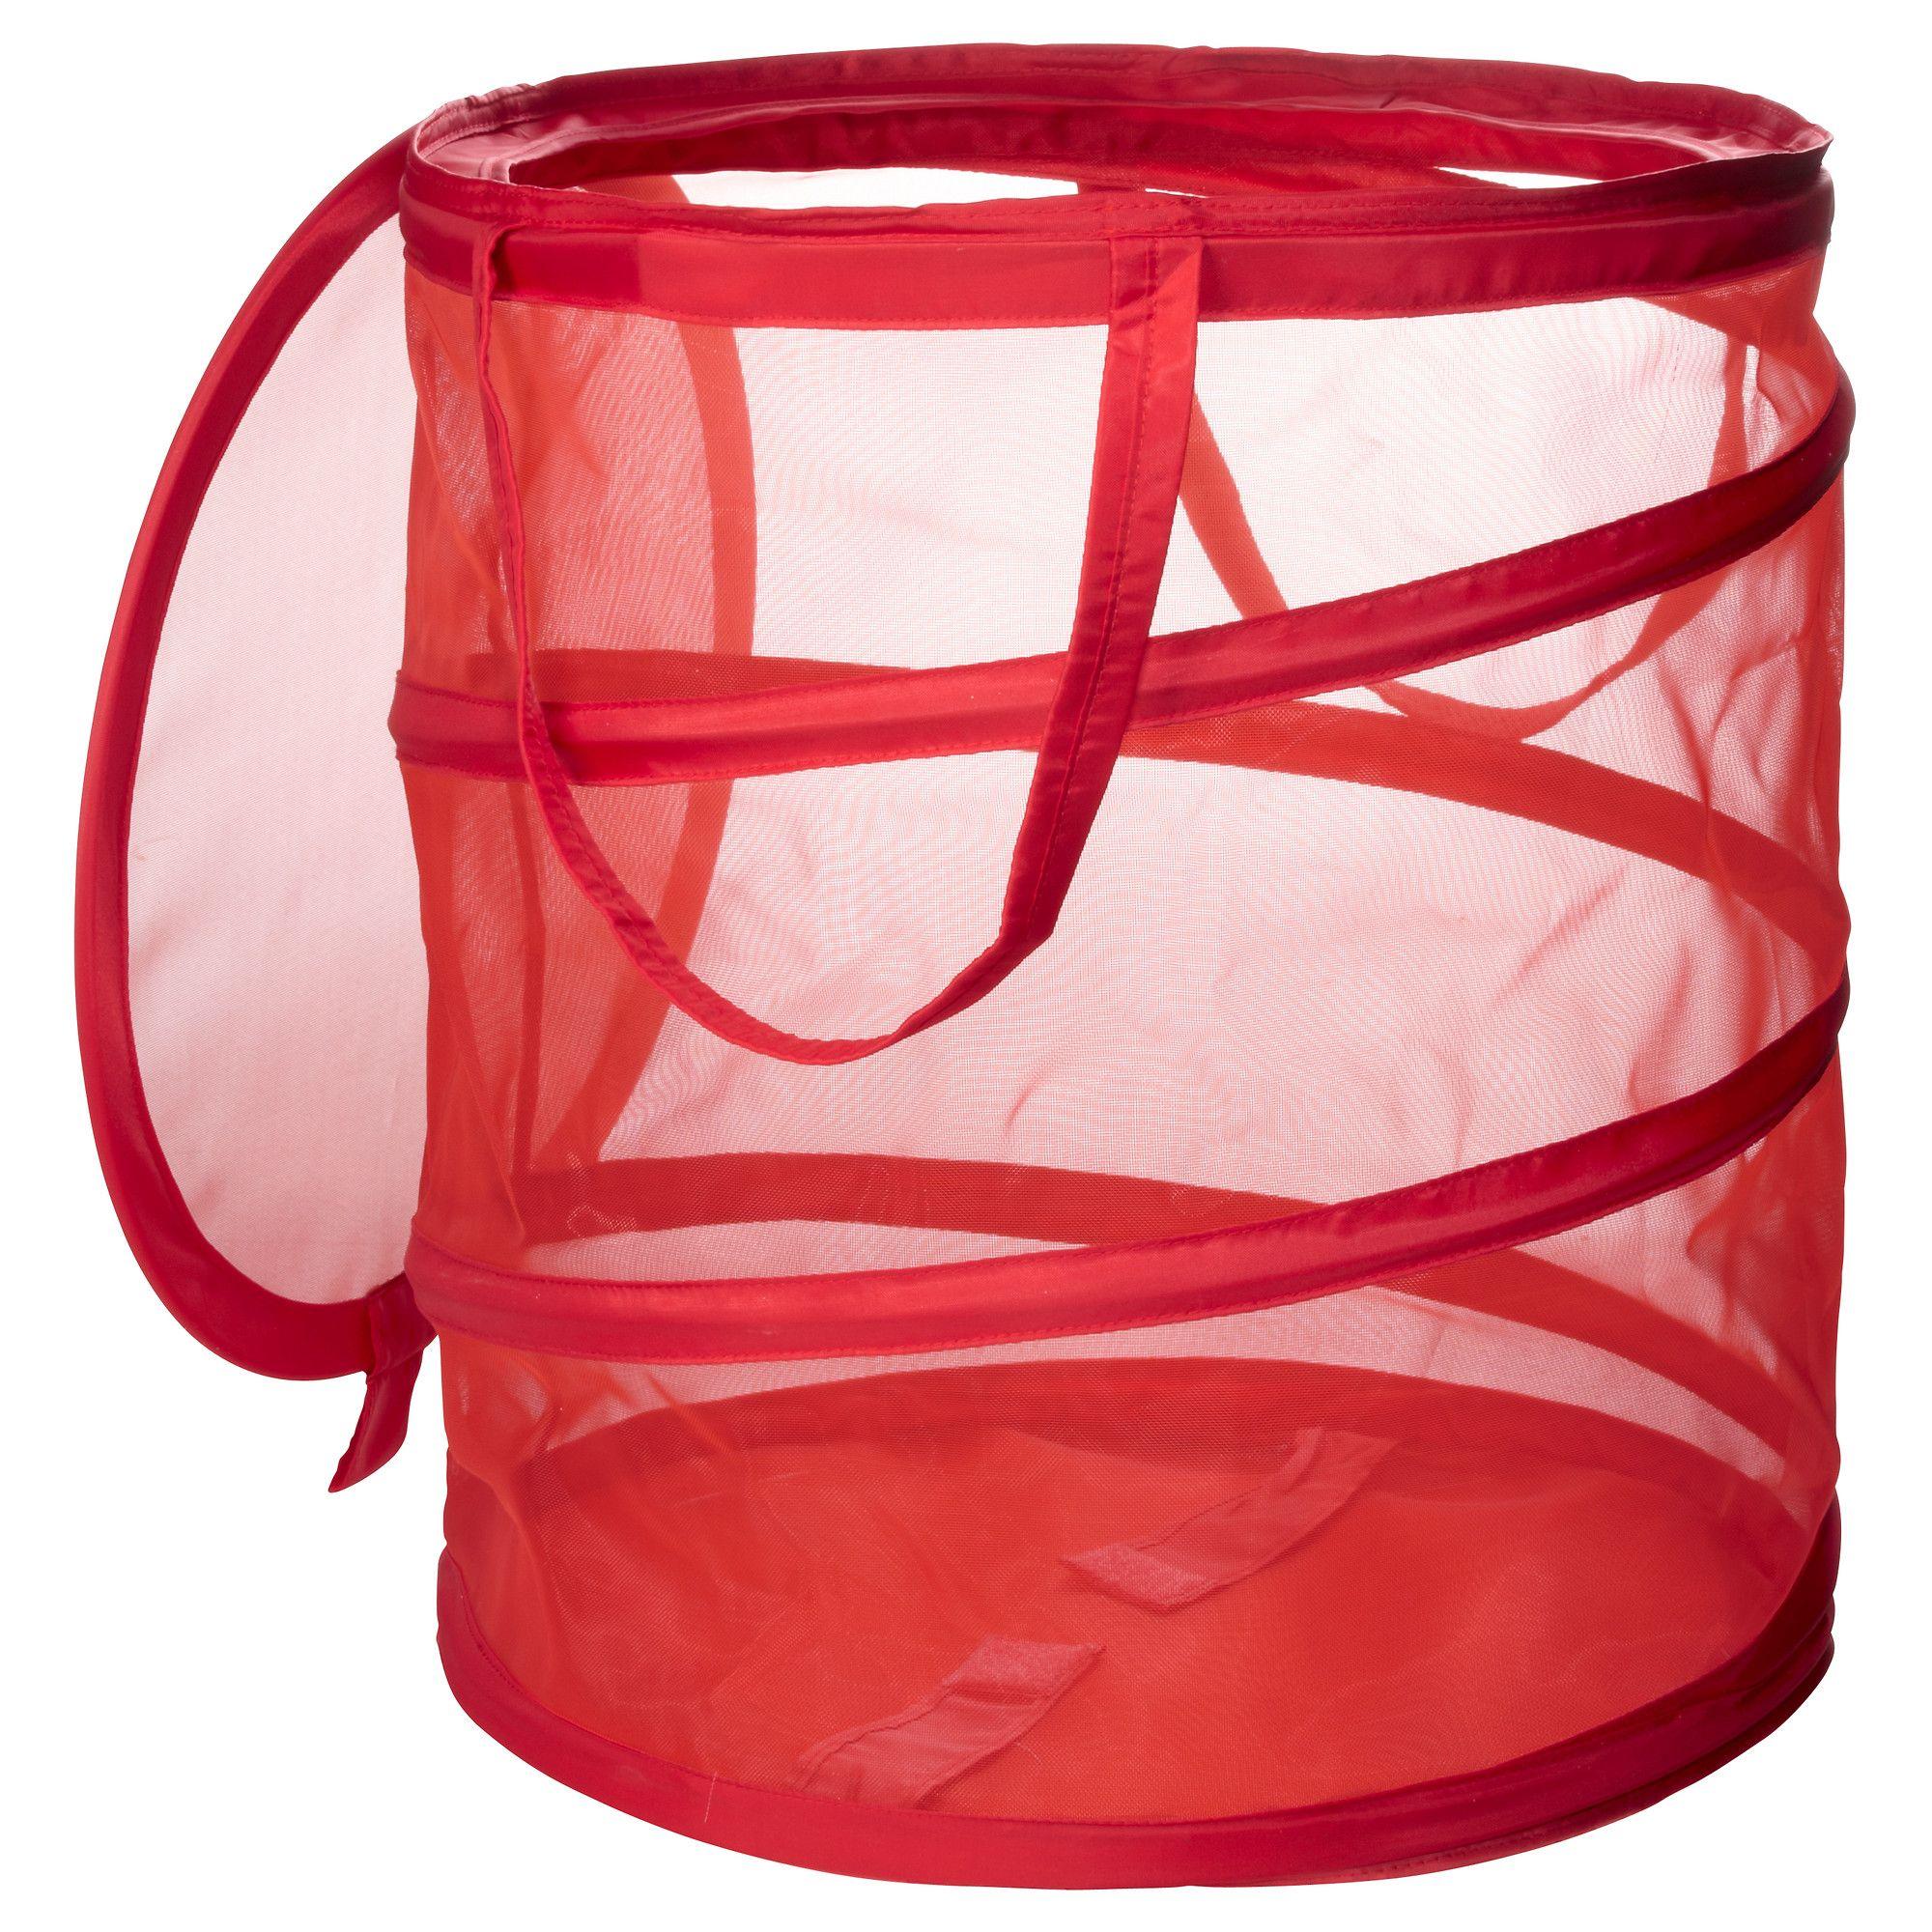 Fyllen Laundry Basket Red Ikea